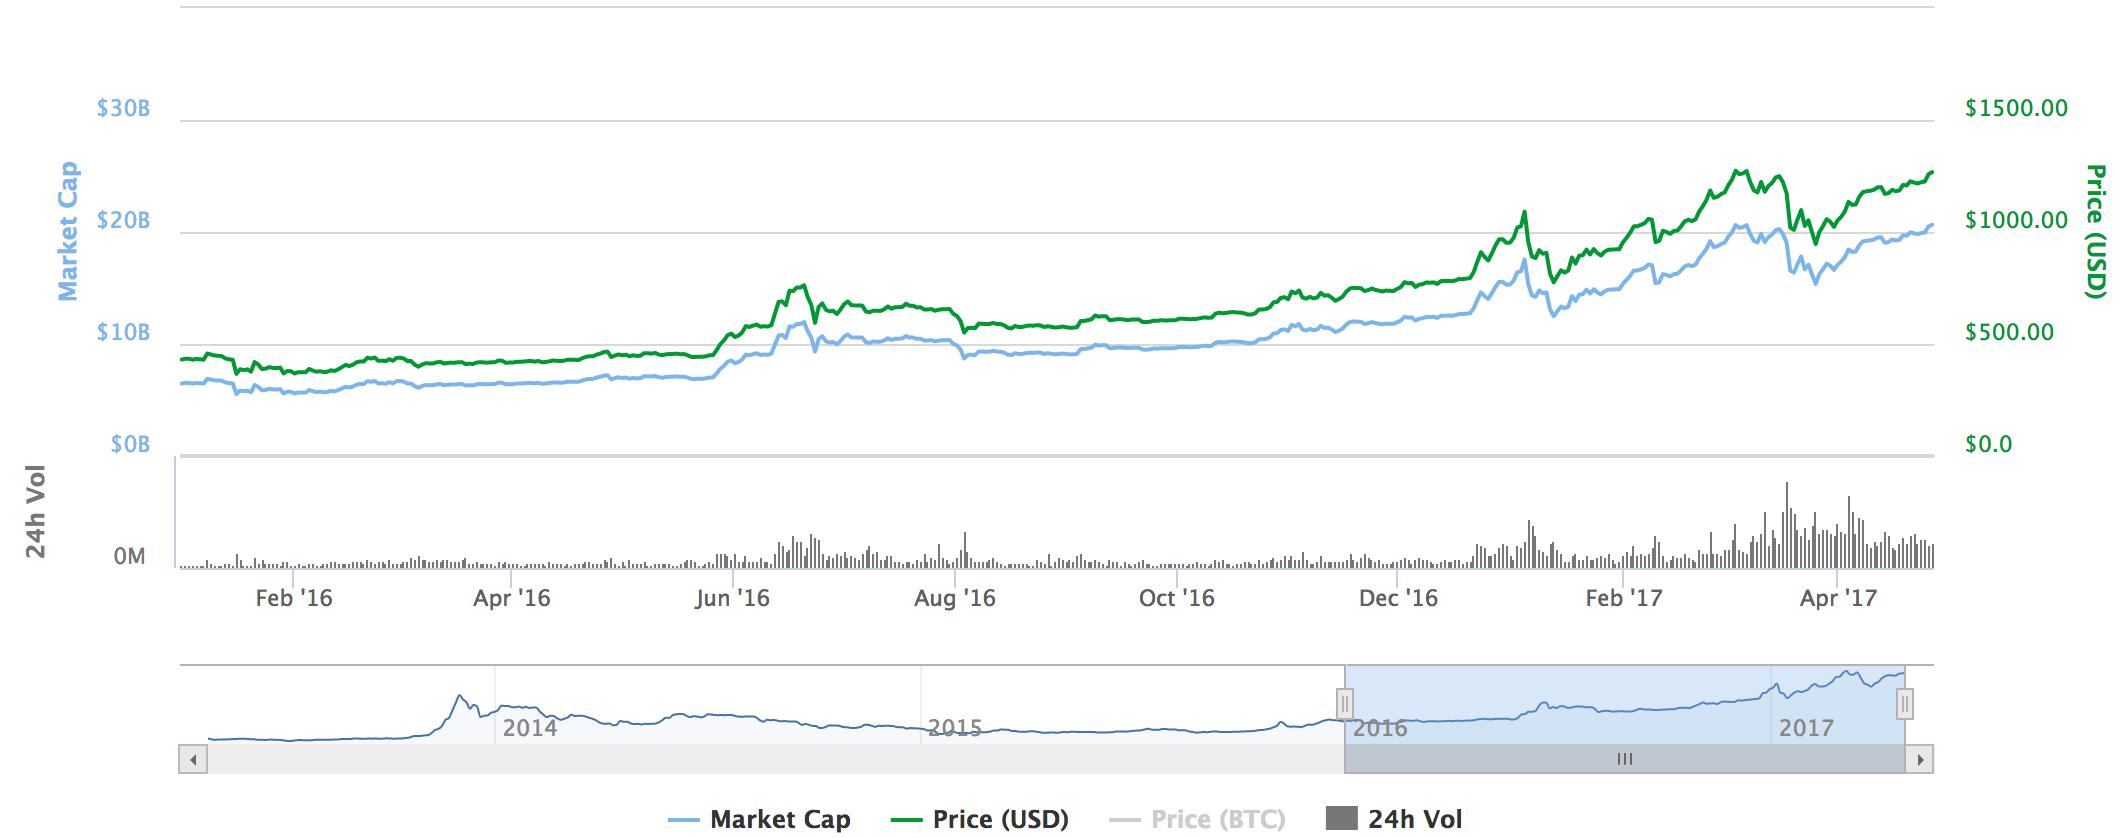 Bitcoin price and market cap